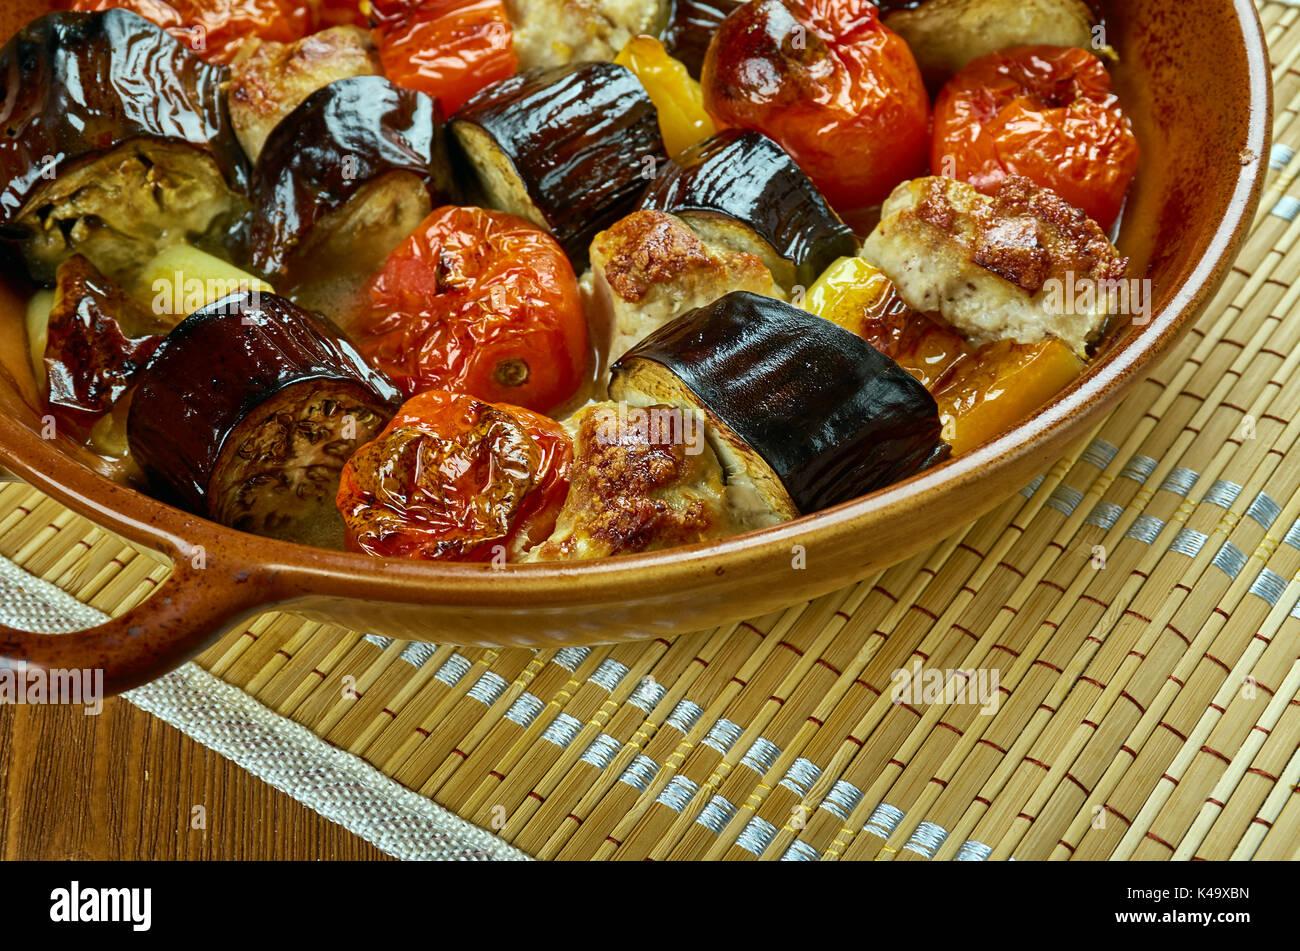 tava-kebab - Kebab in the frying pan, Azerbaijan cuisine